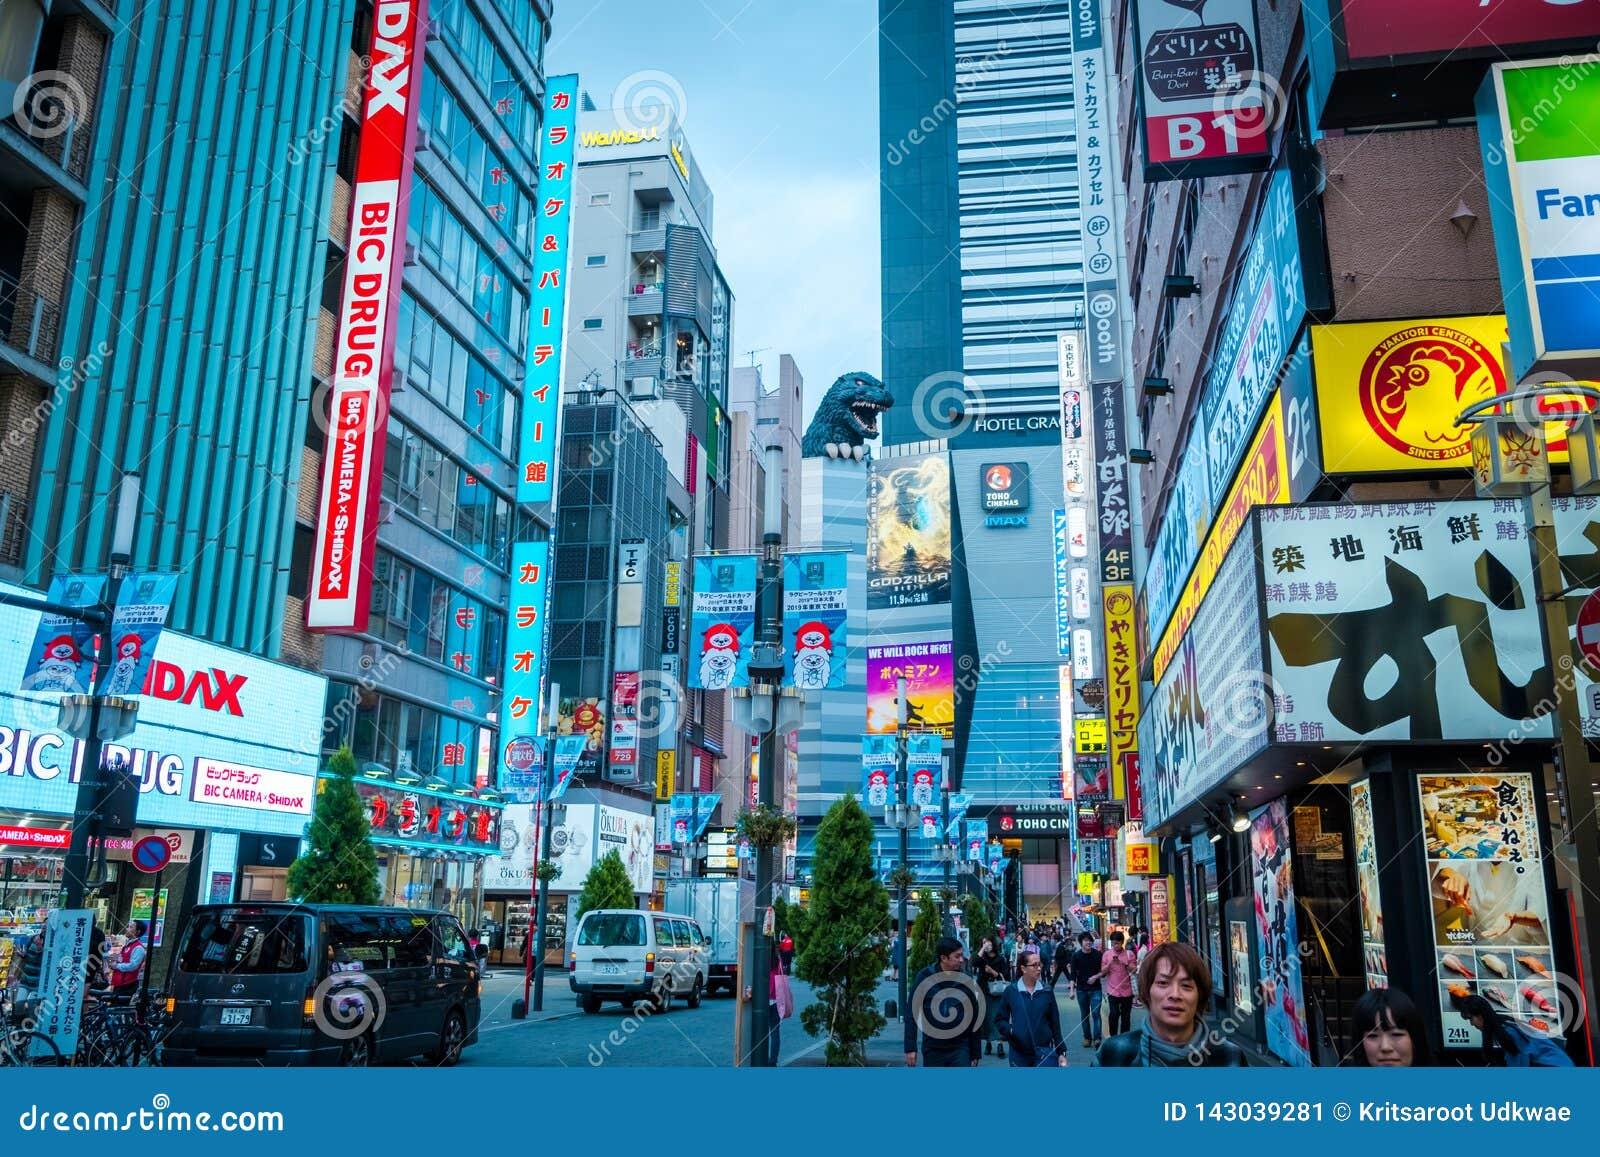 Godzilla at street in Kabukicho district, Shinjuku, Japan.